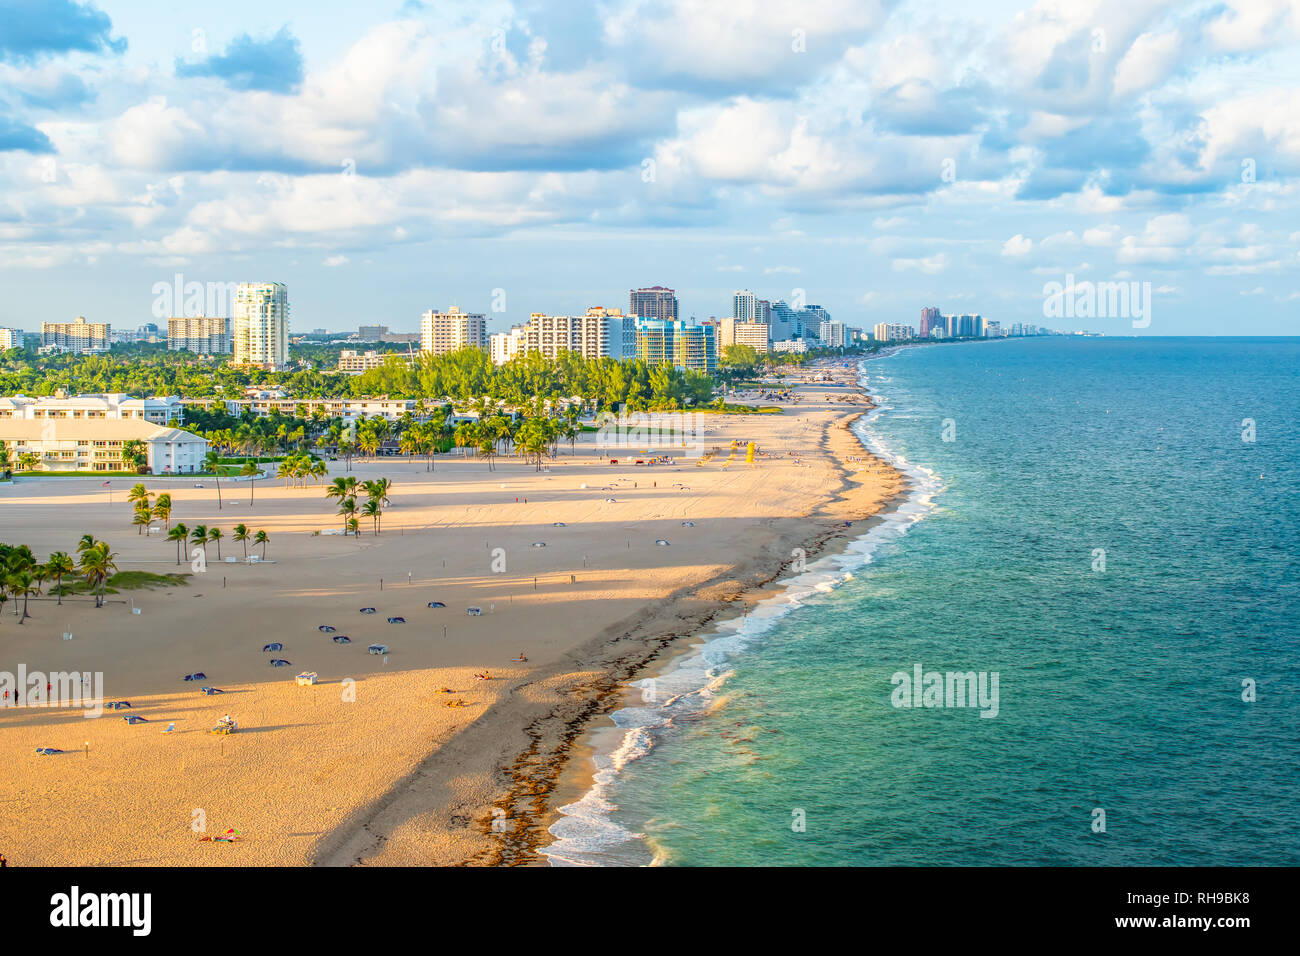 Strand von Fort Lauderdale, Florida Stockbild